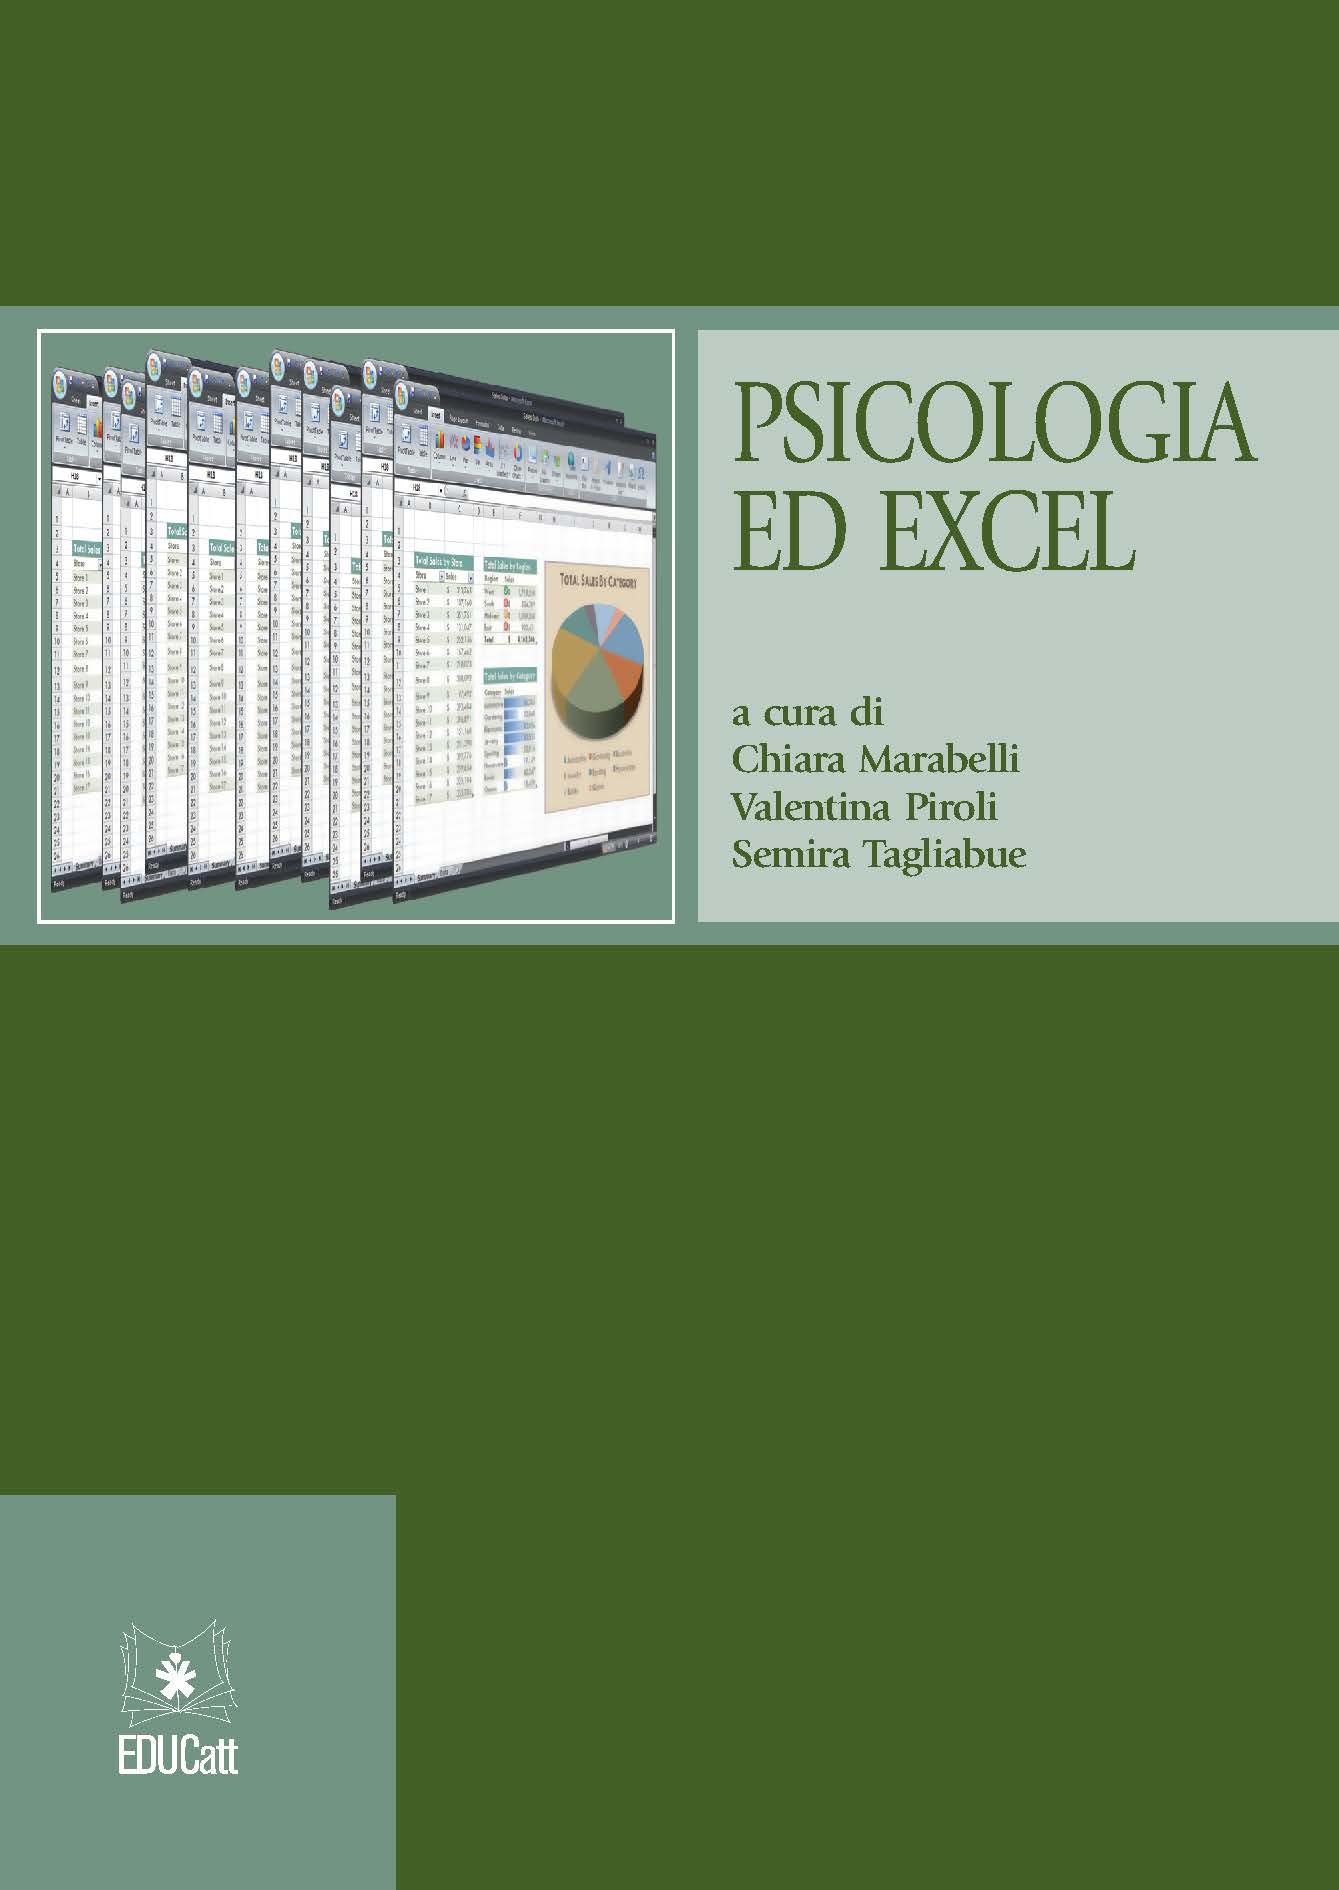 PSICOLOGIA ED EXCEL